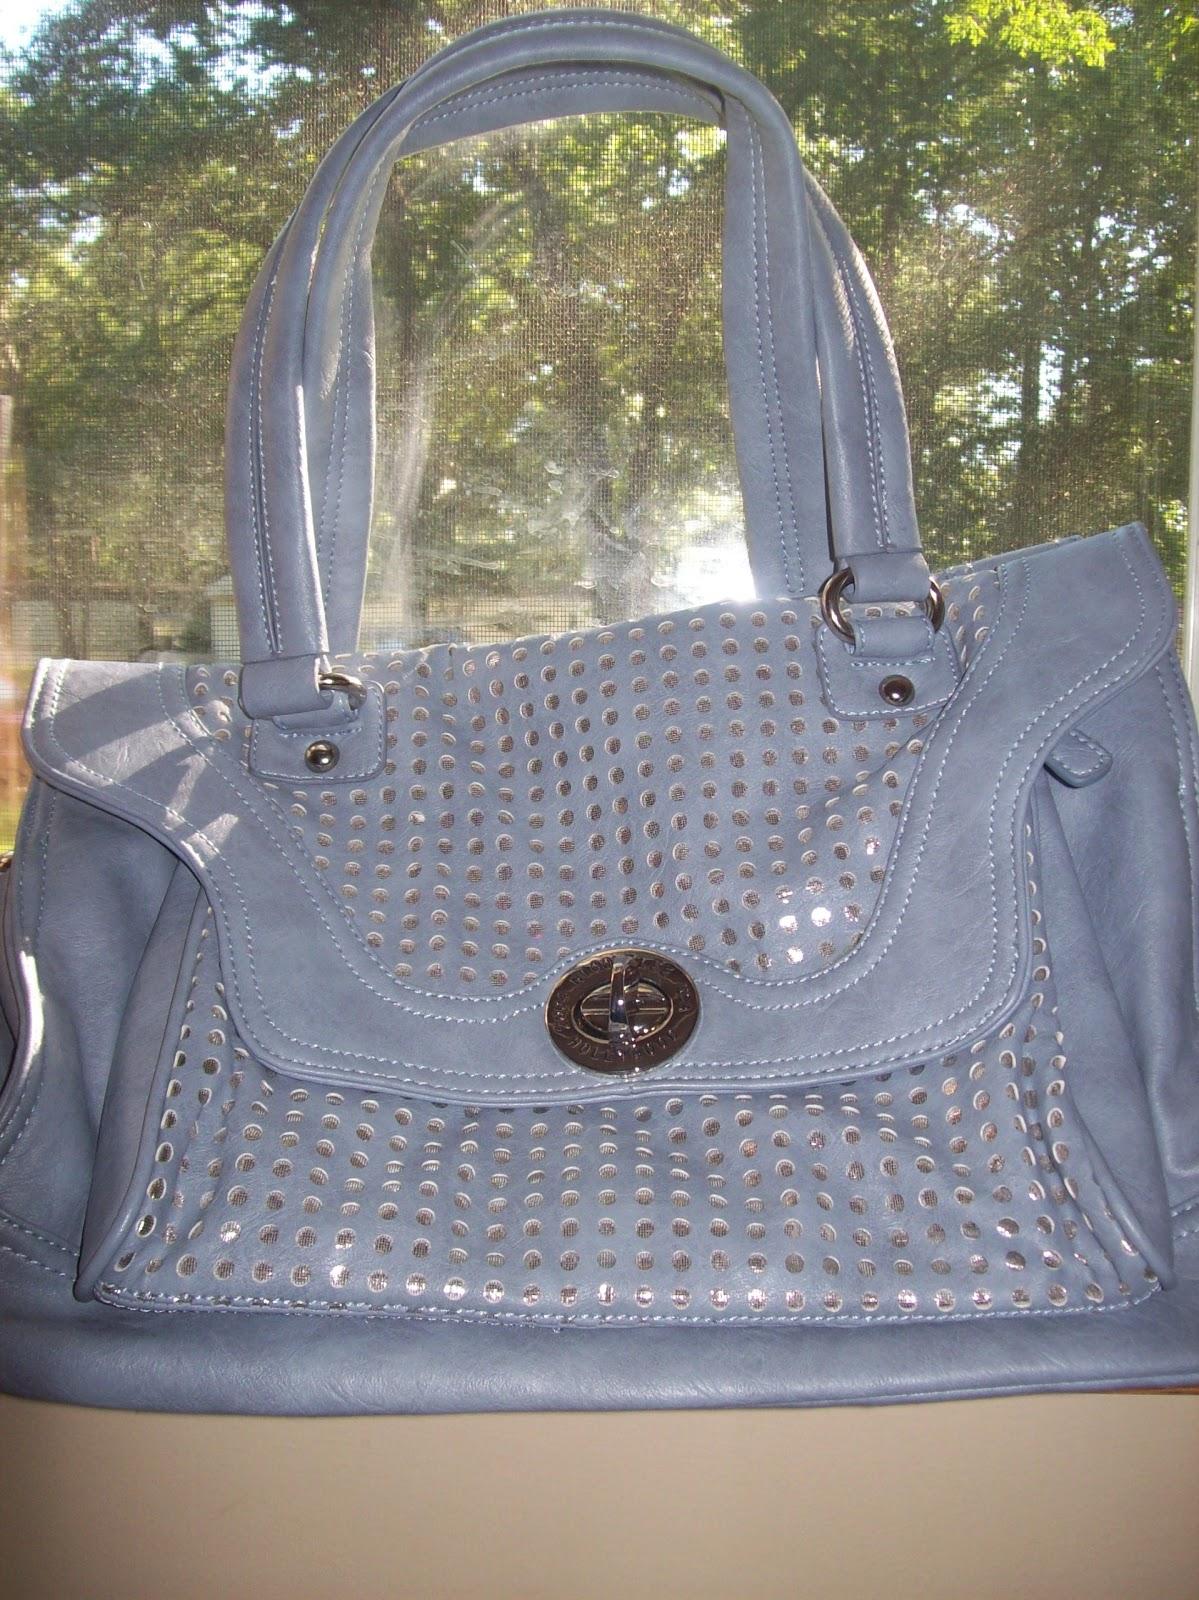 d4936938ab Nicole Lee Handbag Review